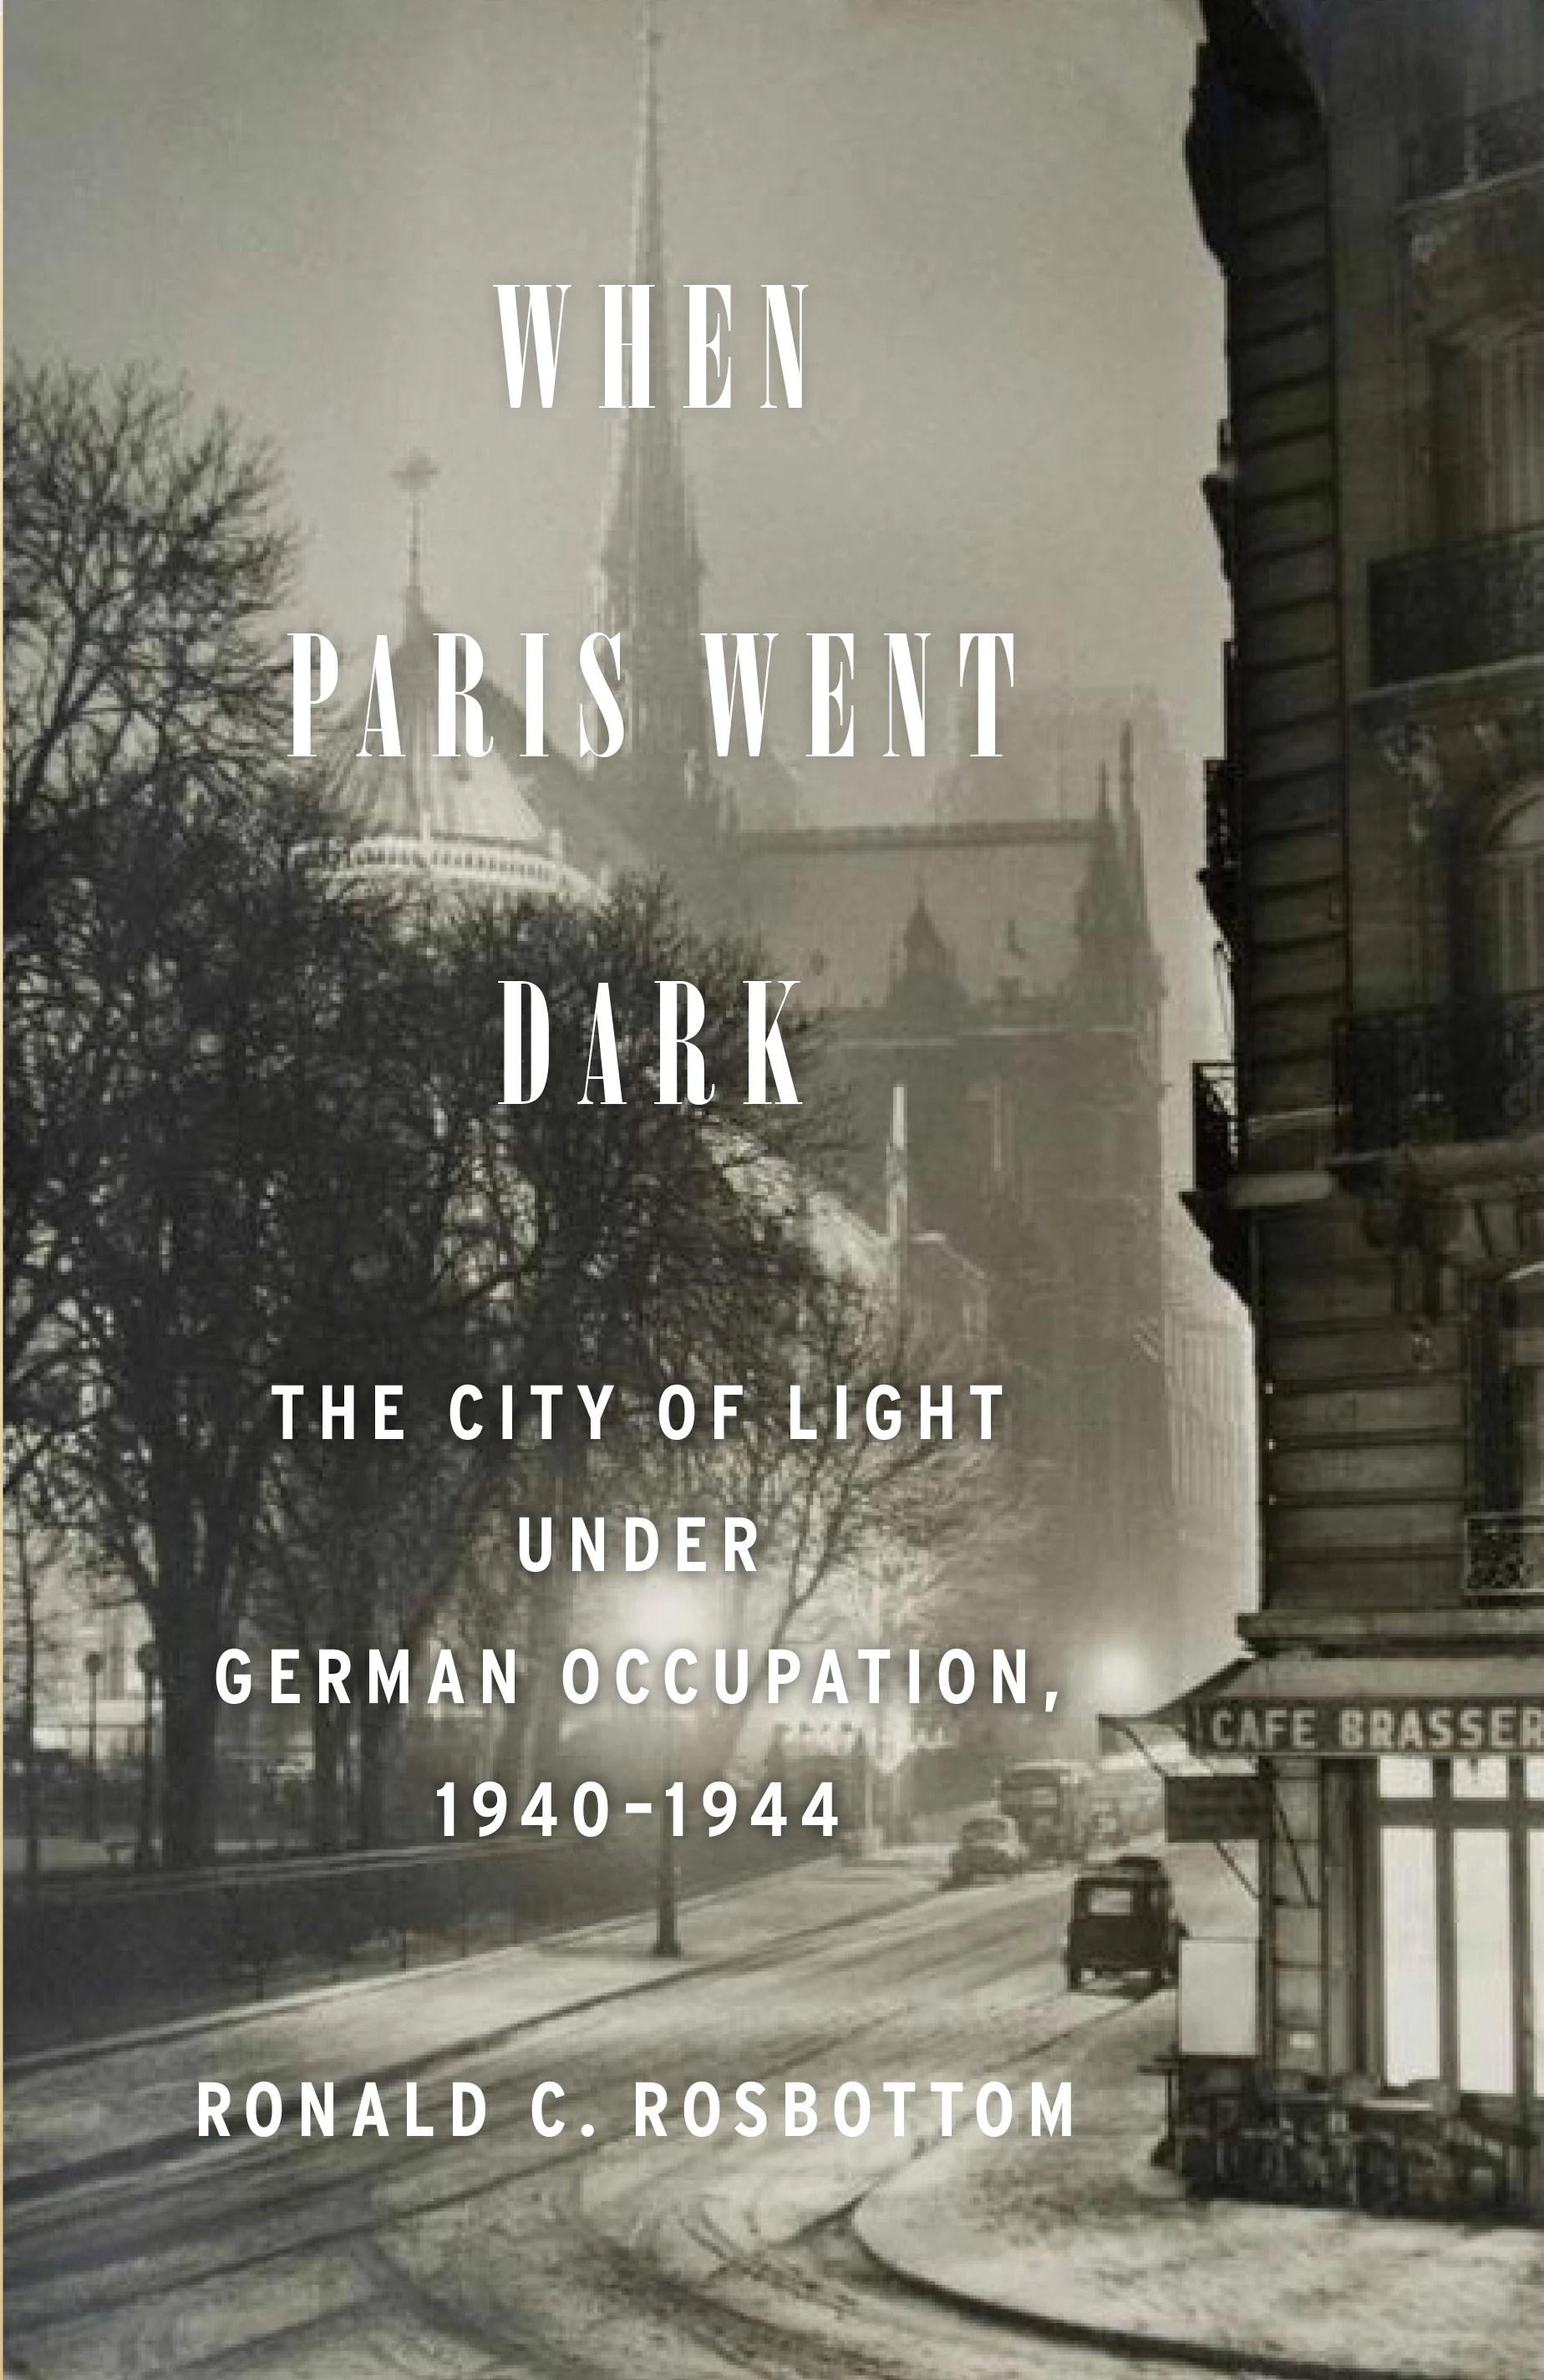 When Paris Went Dark: The City of Light Under German Occupation, 1940-1944, by Ronald C. Rosbottom